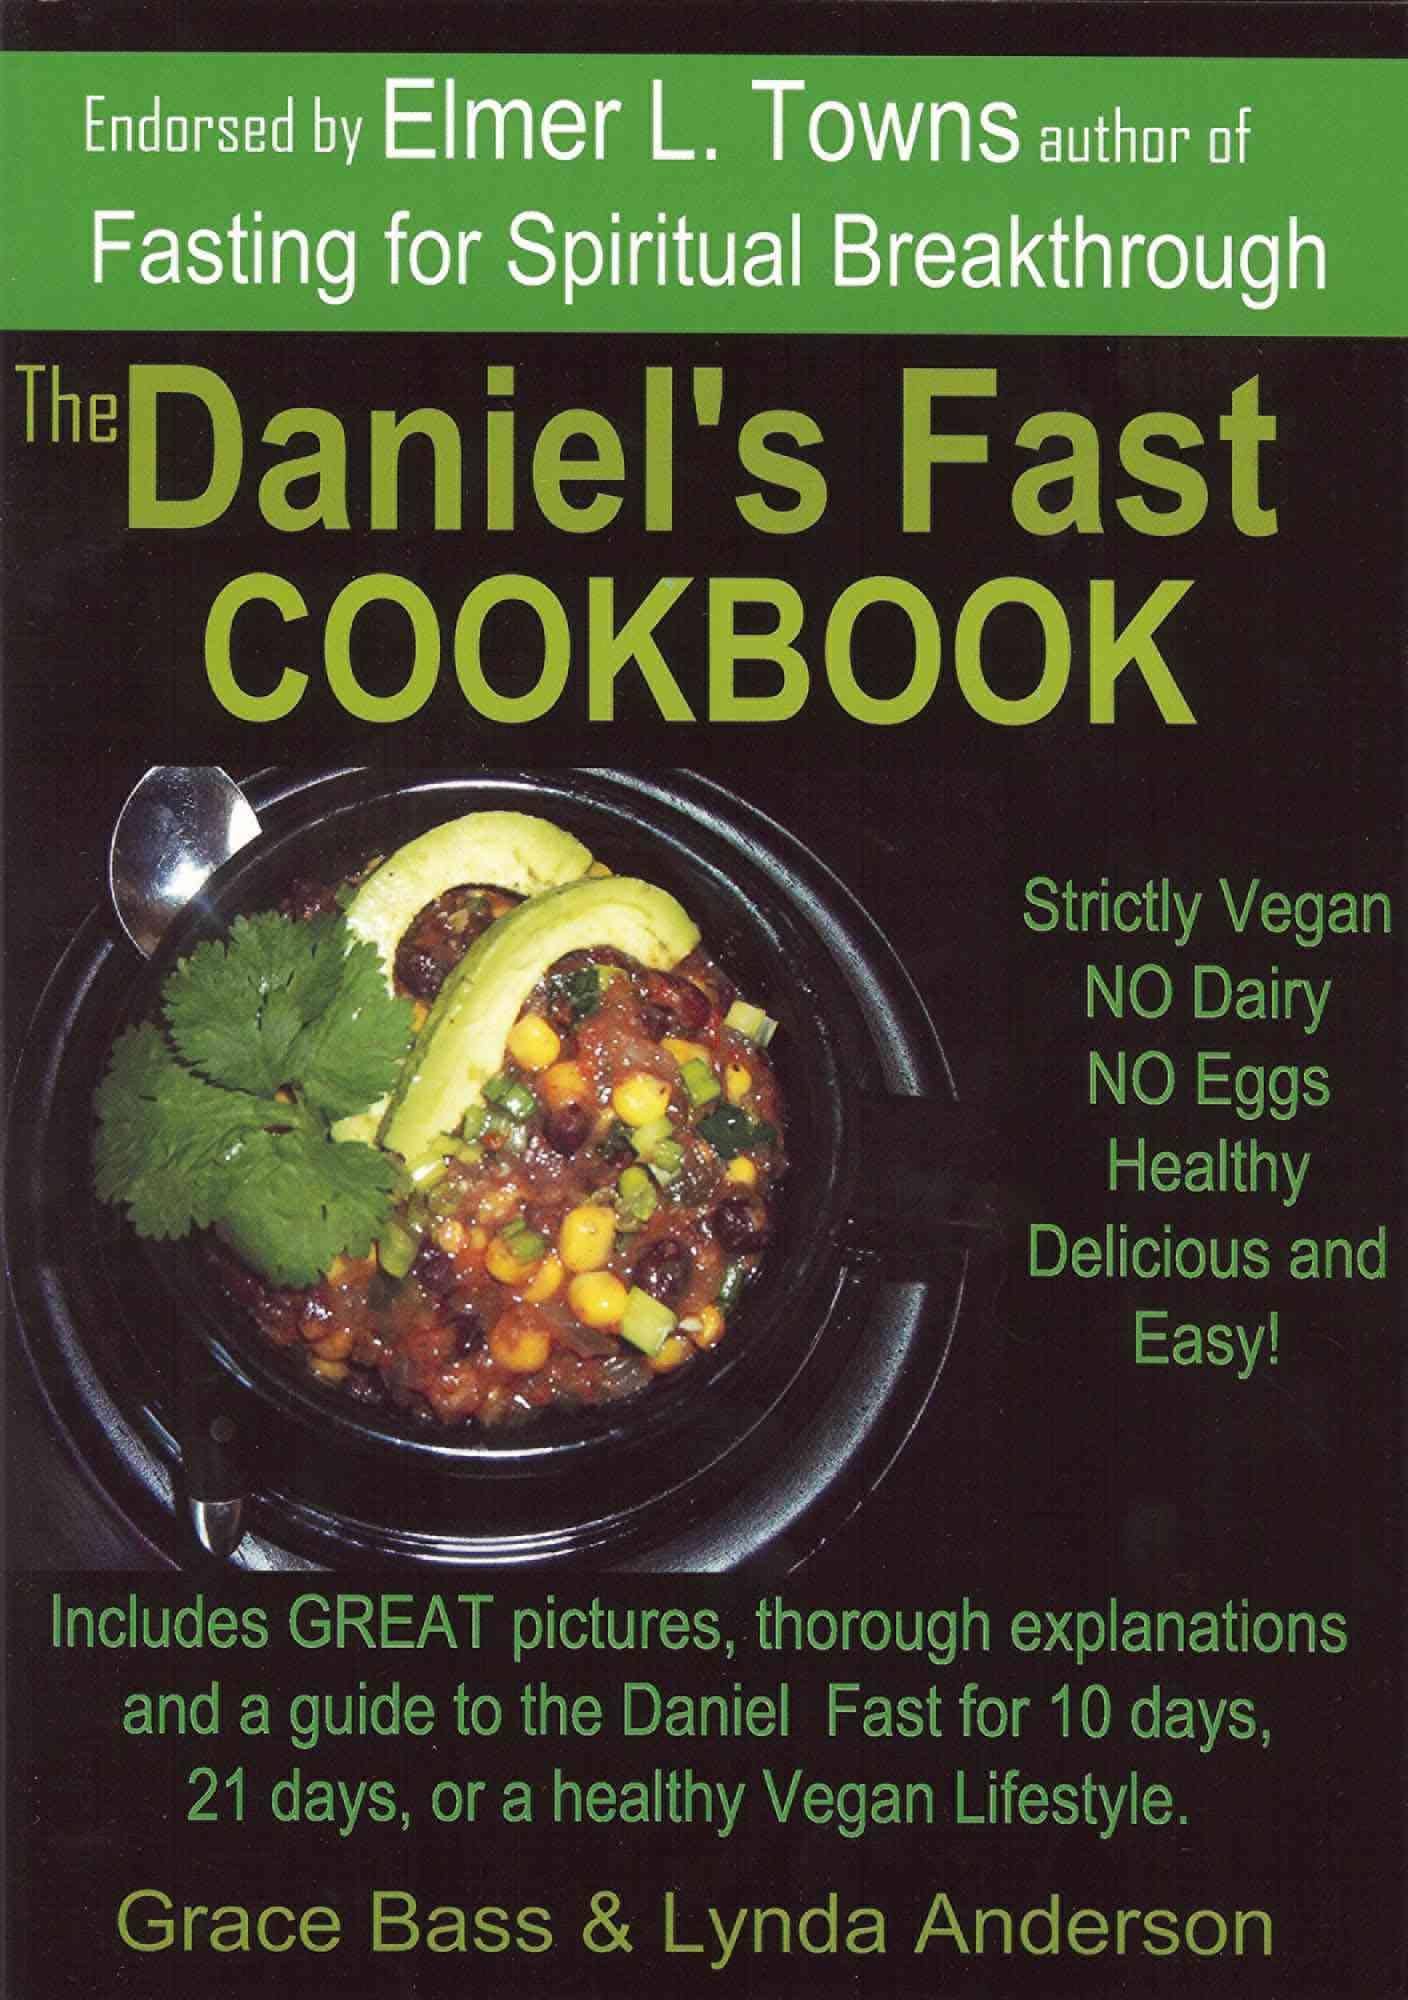 The Daniel's Fast Cookbook (Paperback)